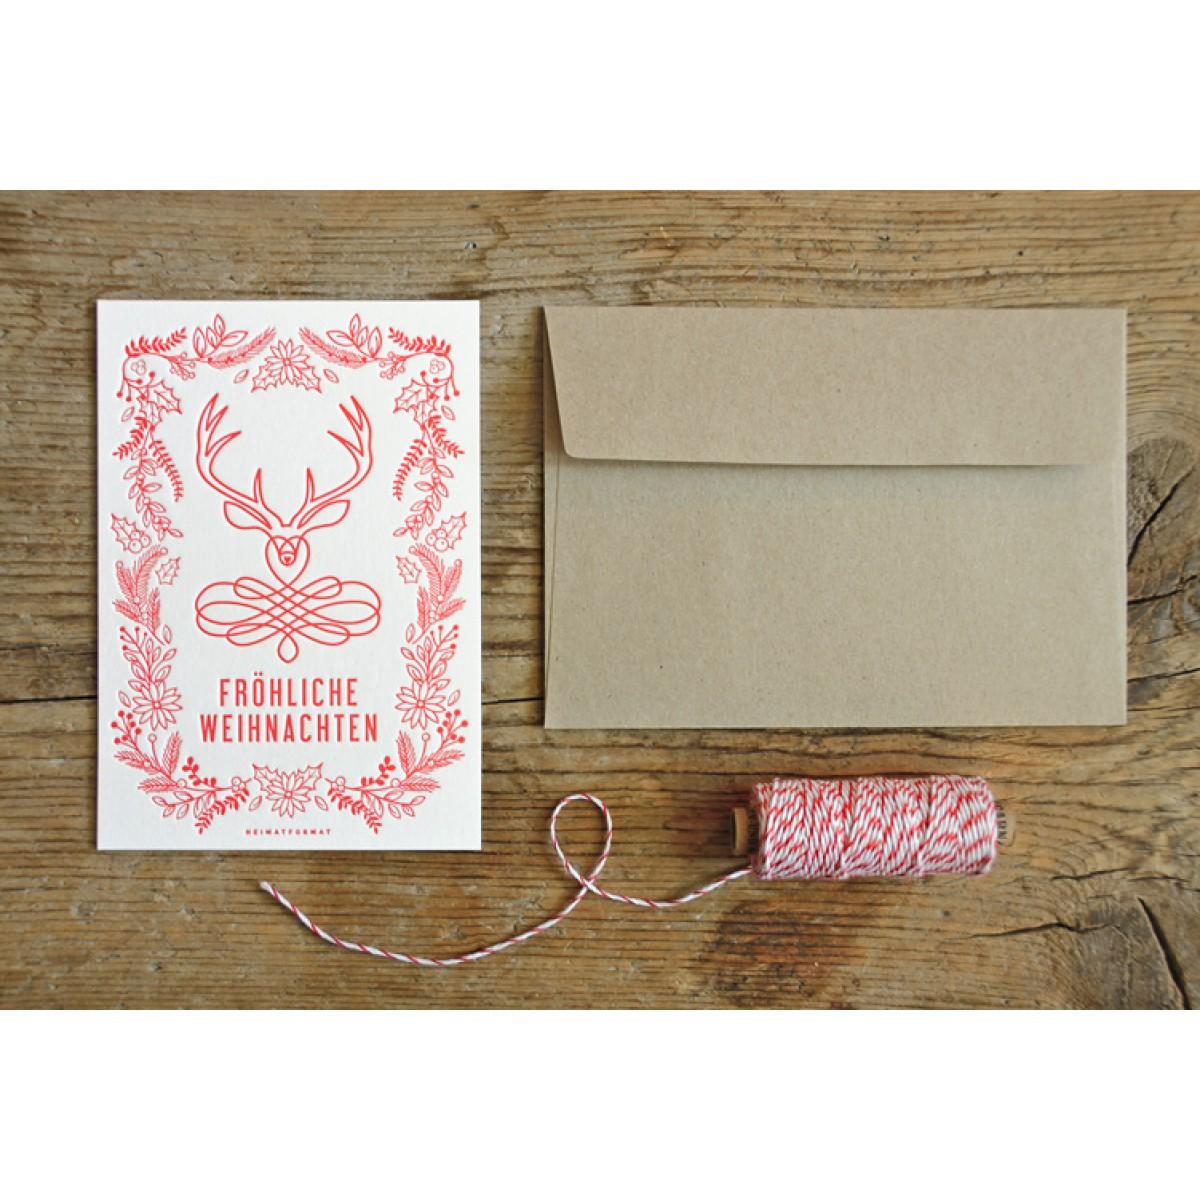 Fröhliche Weihnachten Letterpress-Karte // Inkl. Naturpapier-Kuvert